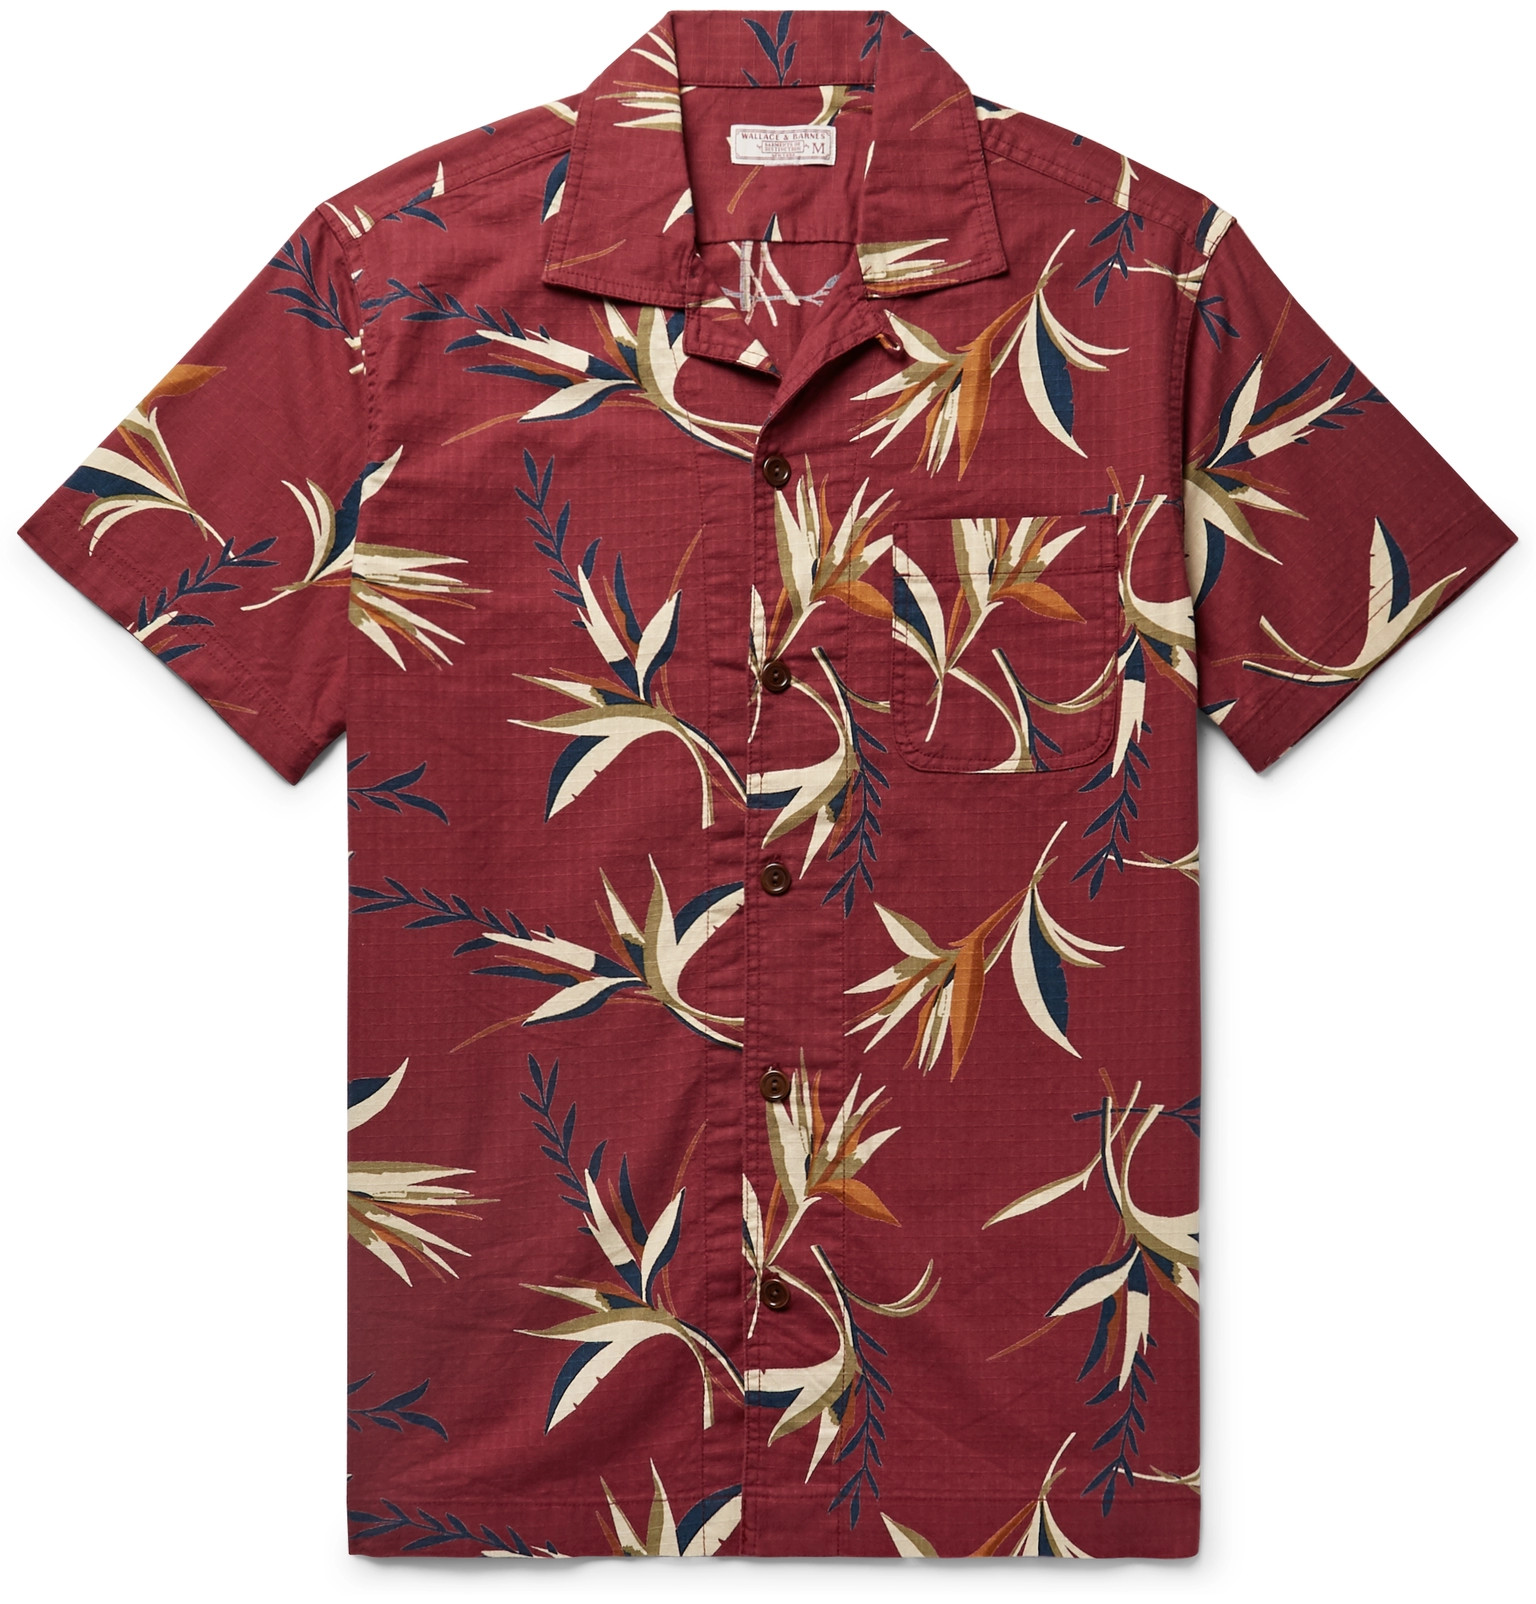 a32e8ac0 J.Crew - Wallace & Barnes Camp-Collar Printed Cotton-Ripstop Shirt